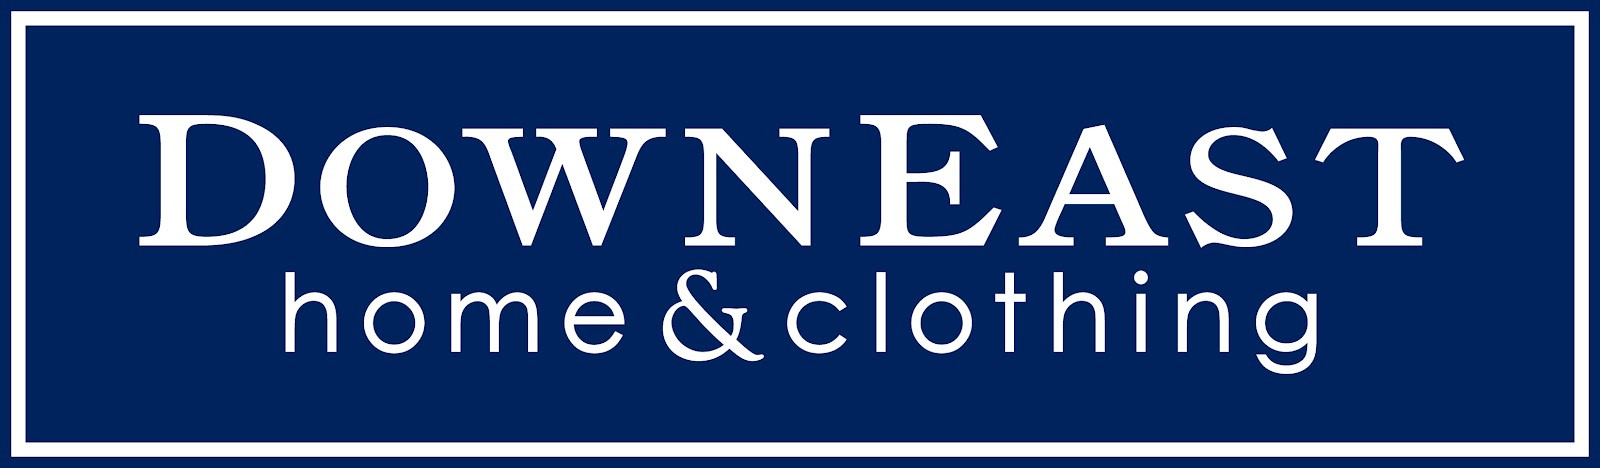 DownEast Home & Clothing - hi res logo.j